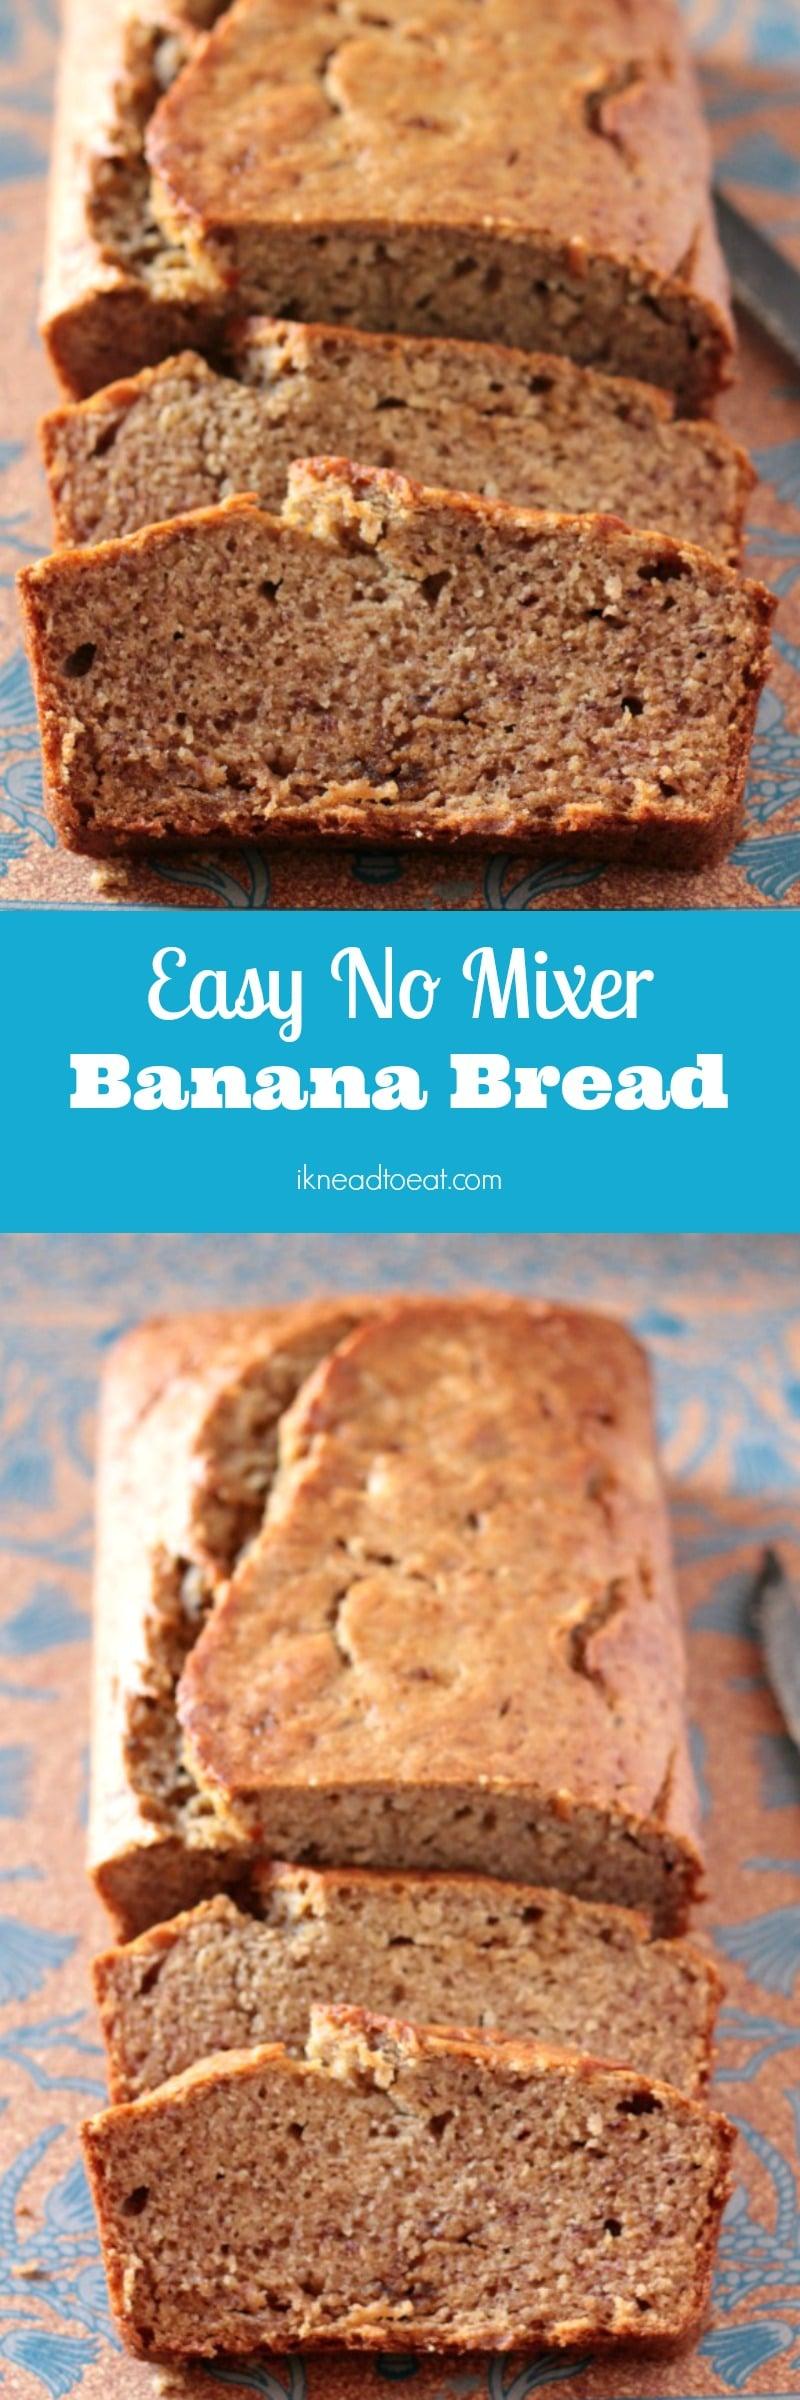 Easy No Mixer Banana Bread